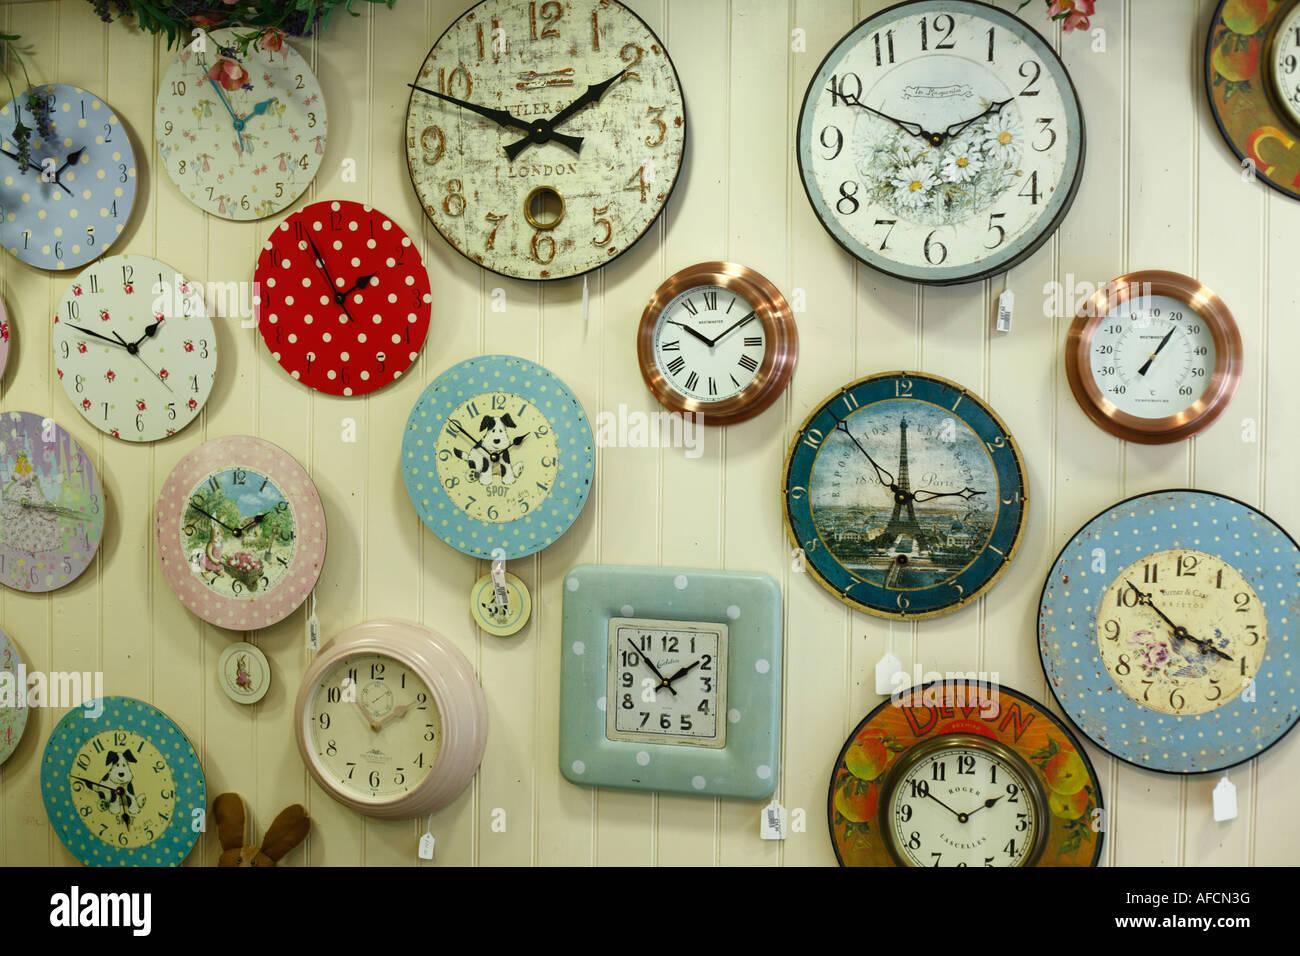 Selection of wall clocks on display for sale. - Stock Image